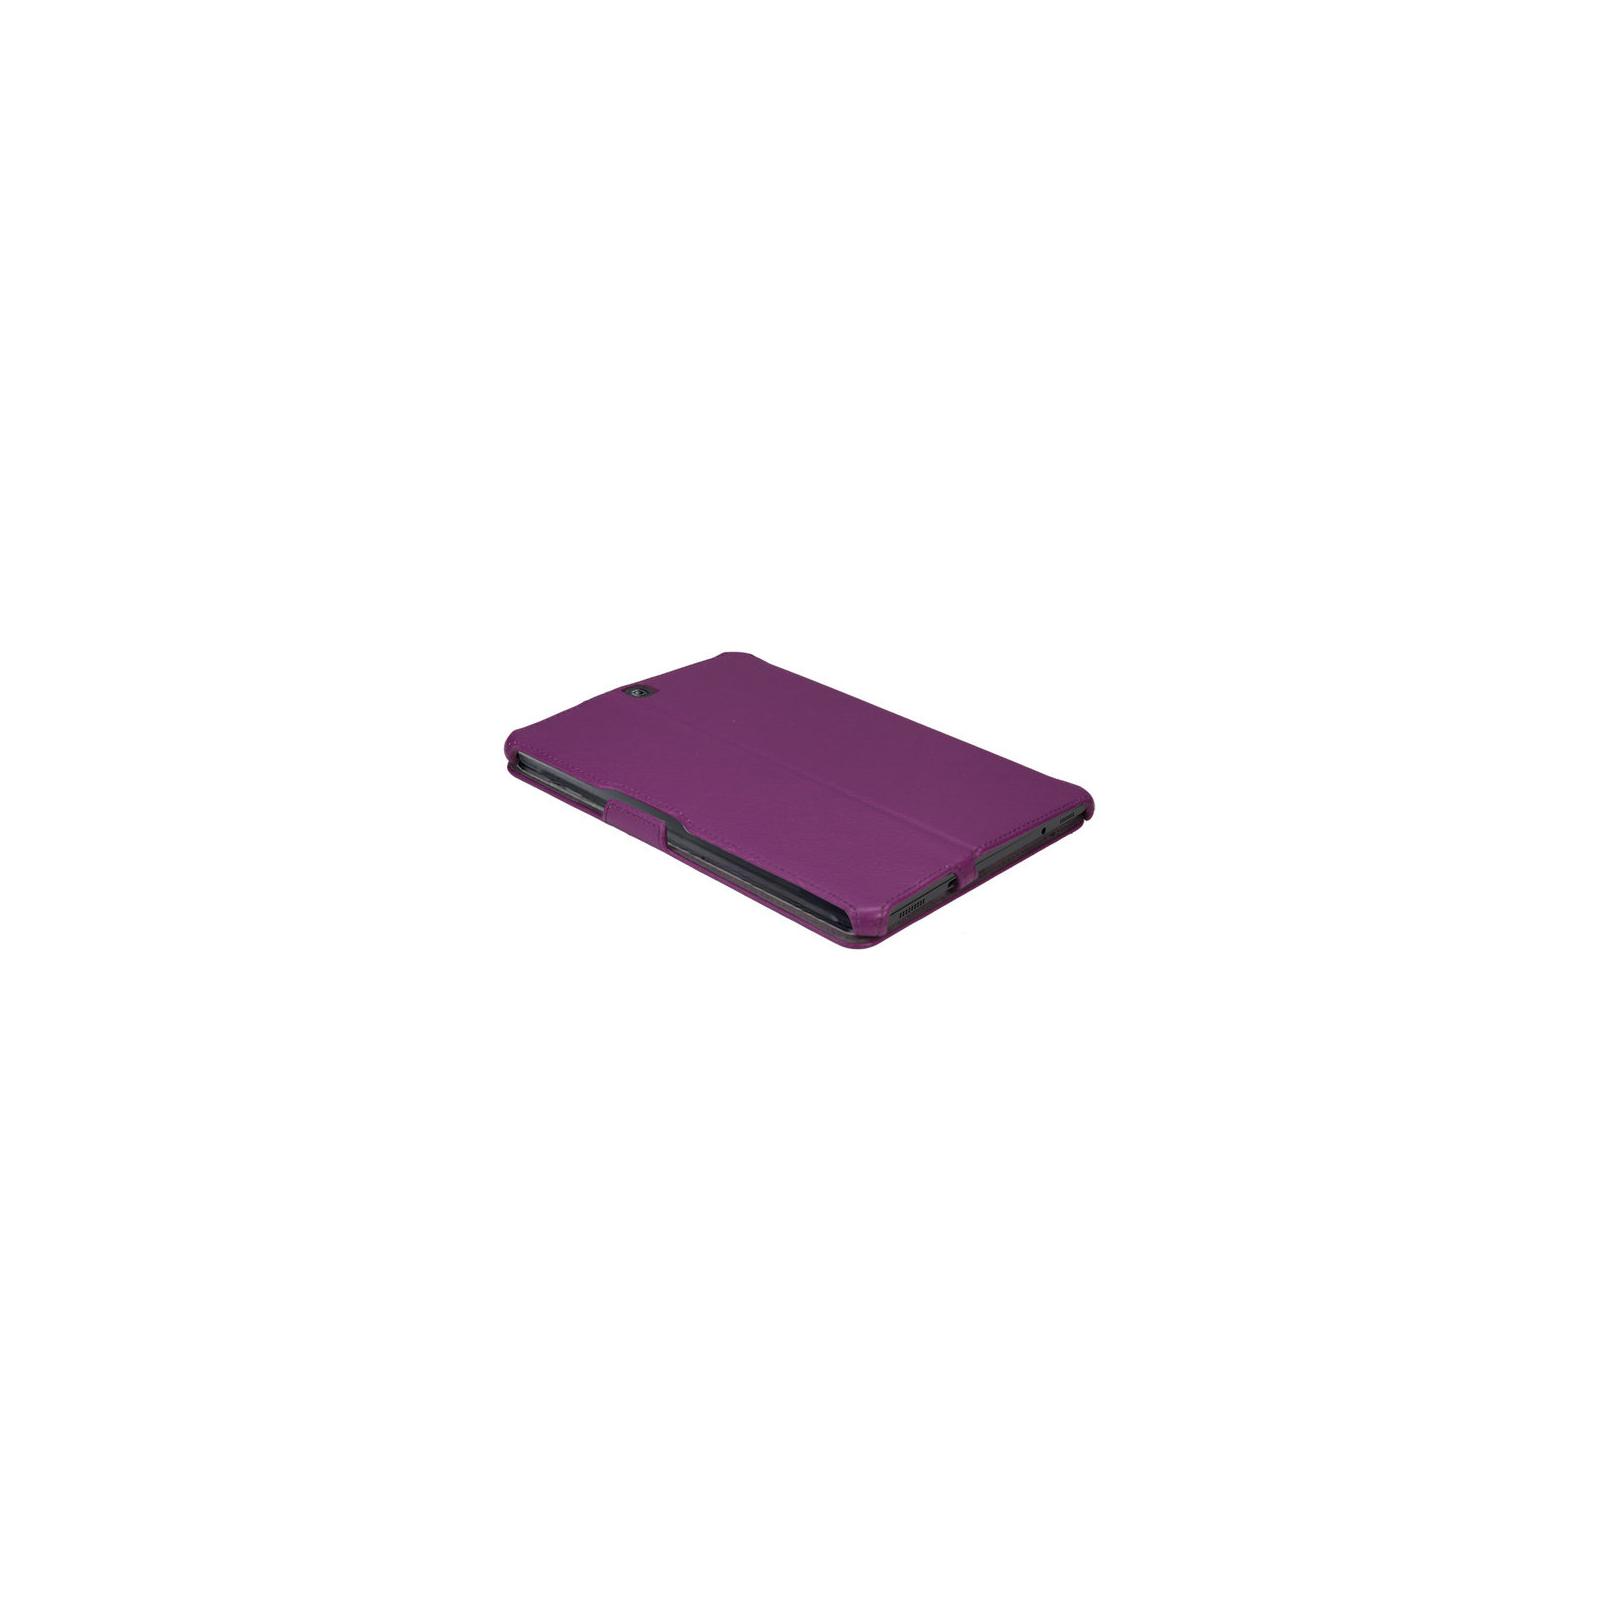 Чехол для планшета AirOn для Samsung Galaxy Tab S 2 9.7 viol (4822352777852) изображение 4